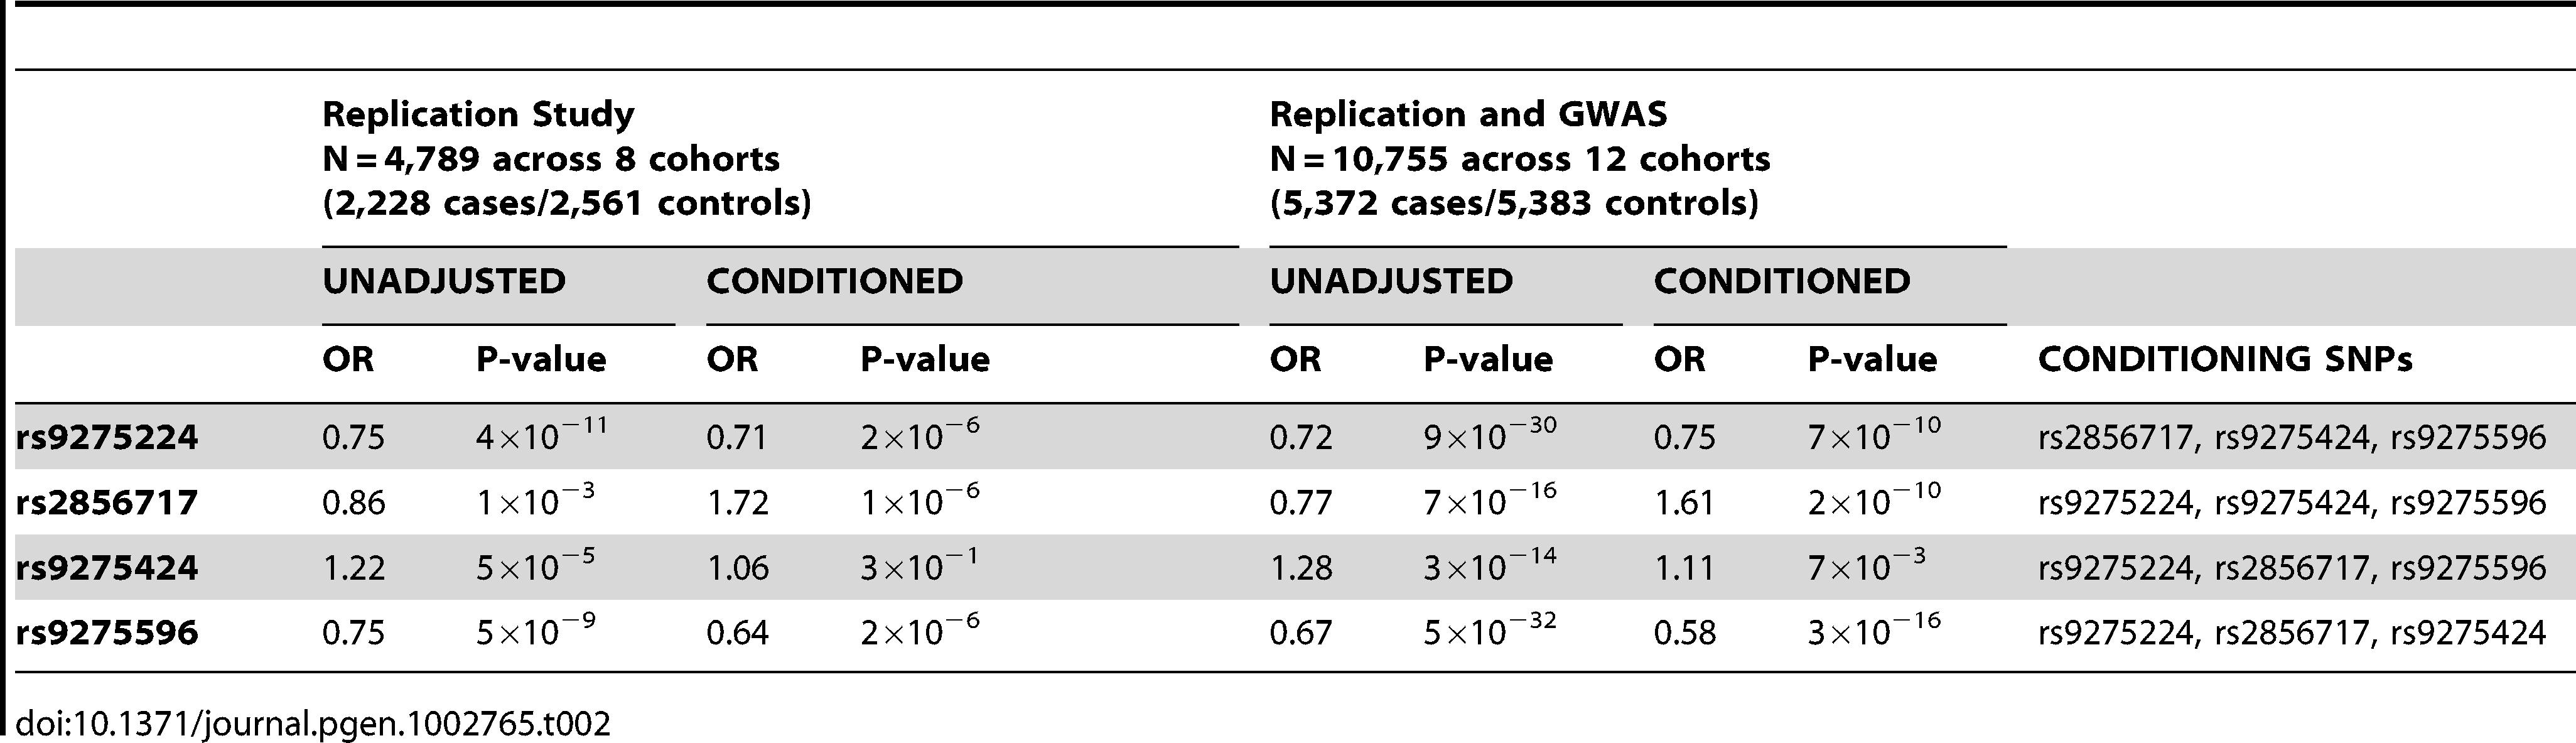 Conditional analysis of the <i>HLA-DQB1, HLA-DQA1, HLA-DRB1</i> locus.